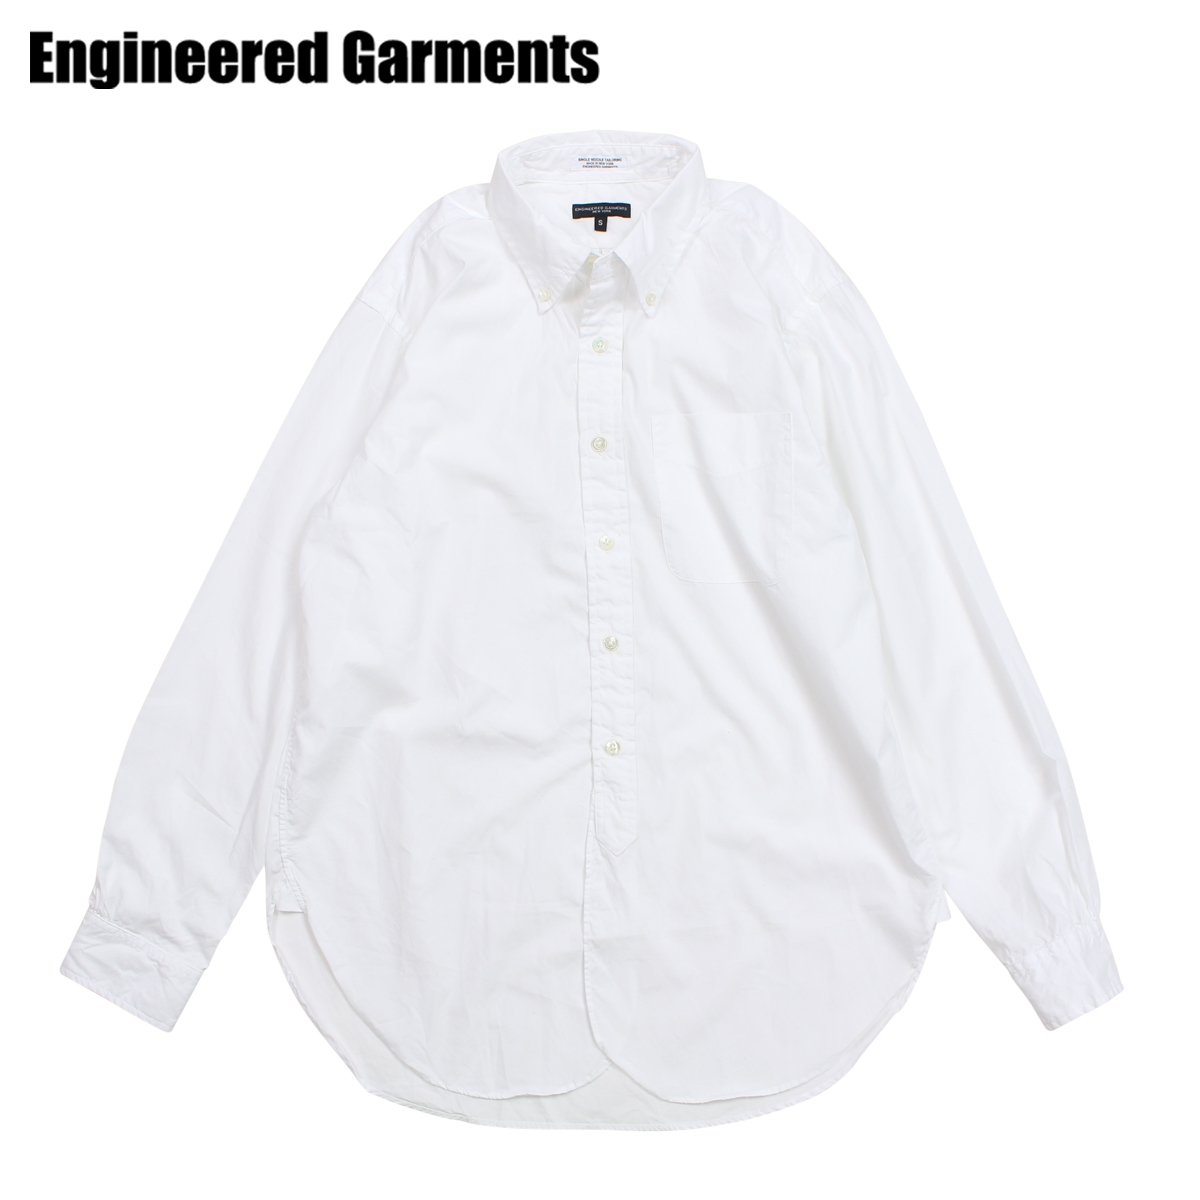 ENGINEERED GARMENTS エンジニアドガーメンツ シャツ メンズ 長袖 オックスフォードシャツ 19 CENTURY BUTTON DOWN SHIRT ホワイト 白 F8A0111